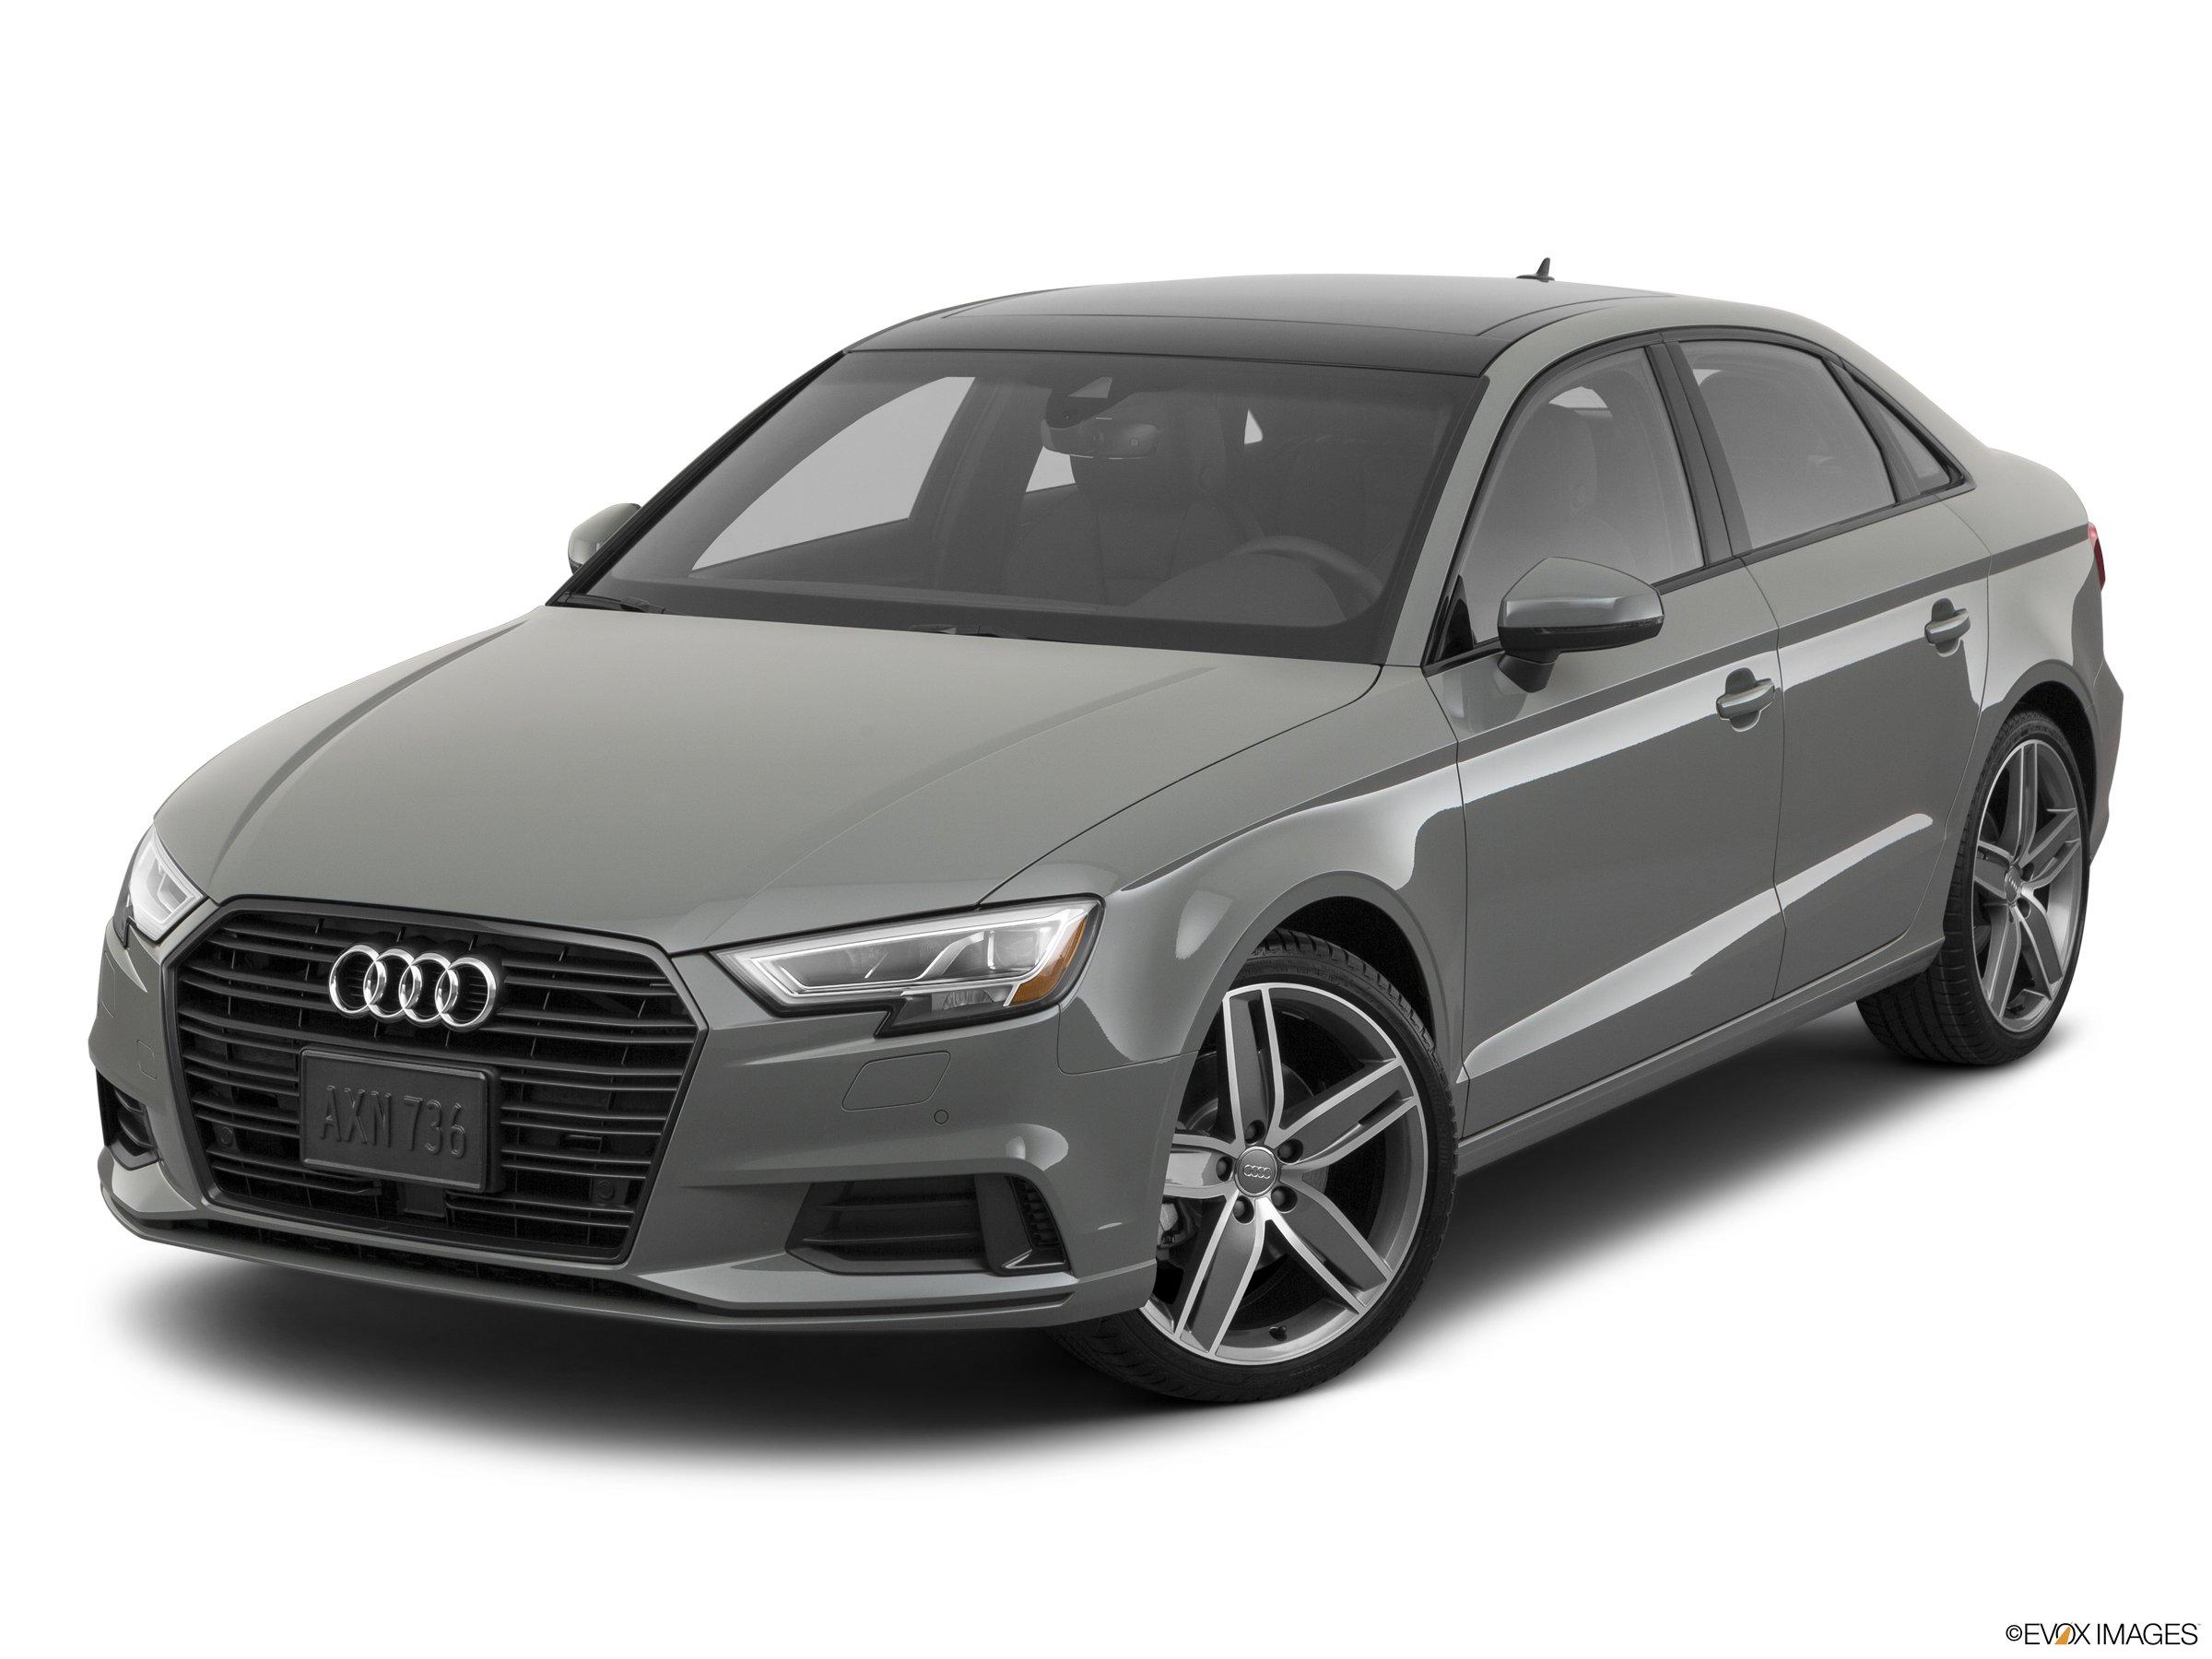 2020 Audi A3 Premium Plus 40 TFSI FWD sedan